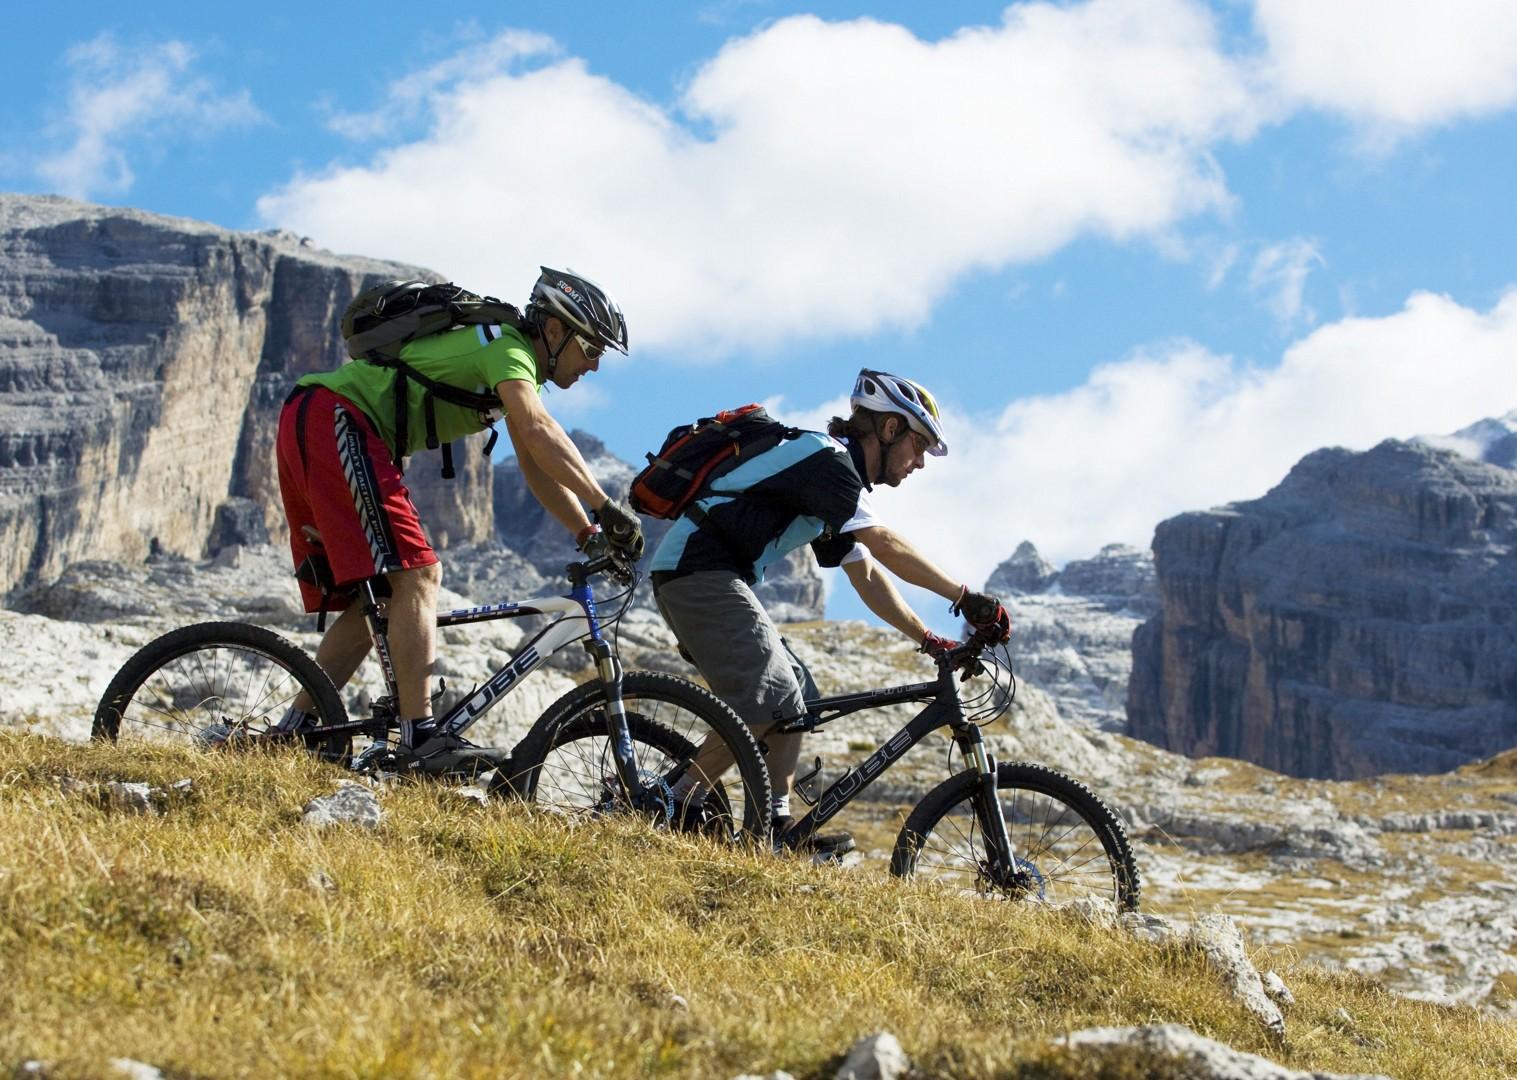 Brenta_Bike_2007_169.jpg - Italy - Dolomites of Brenta - Guided Mountain Bike Holiday - Mountain Biking